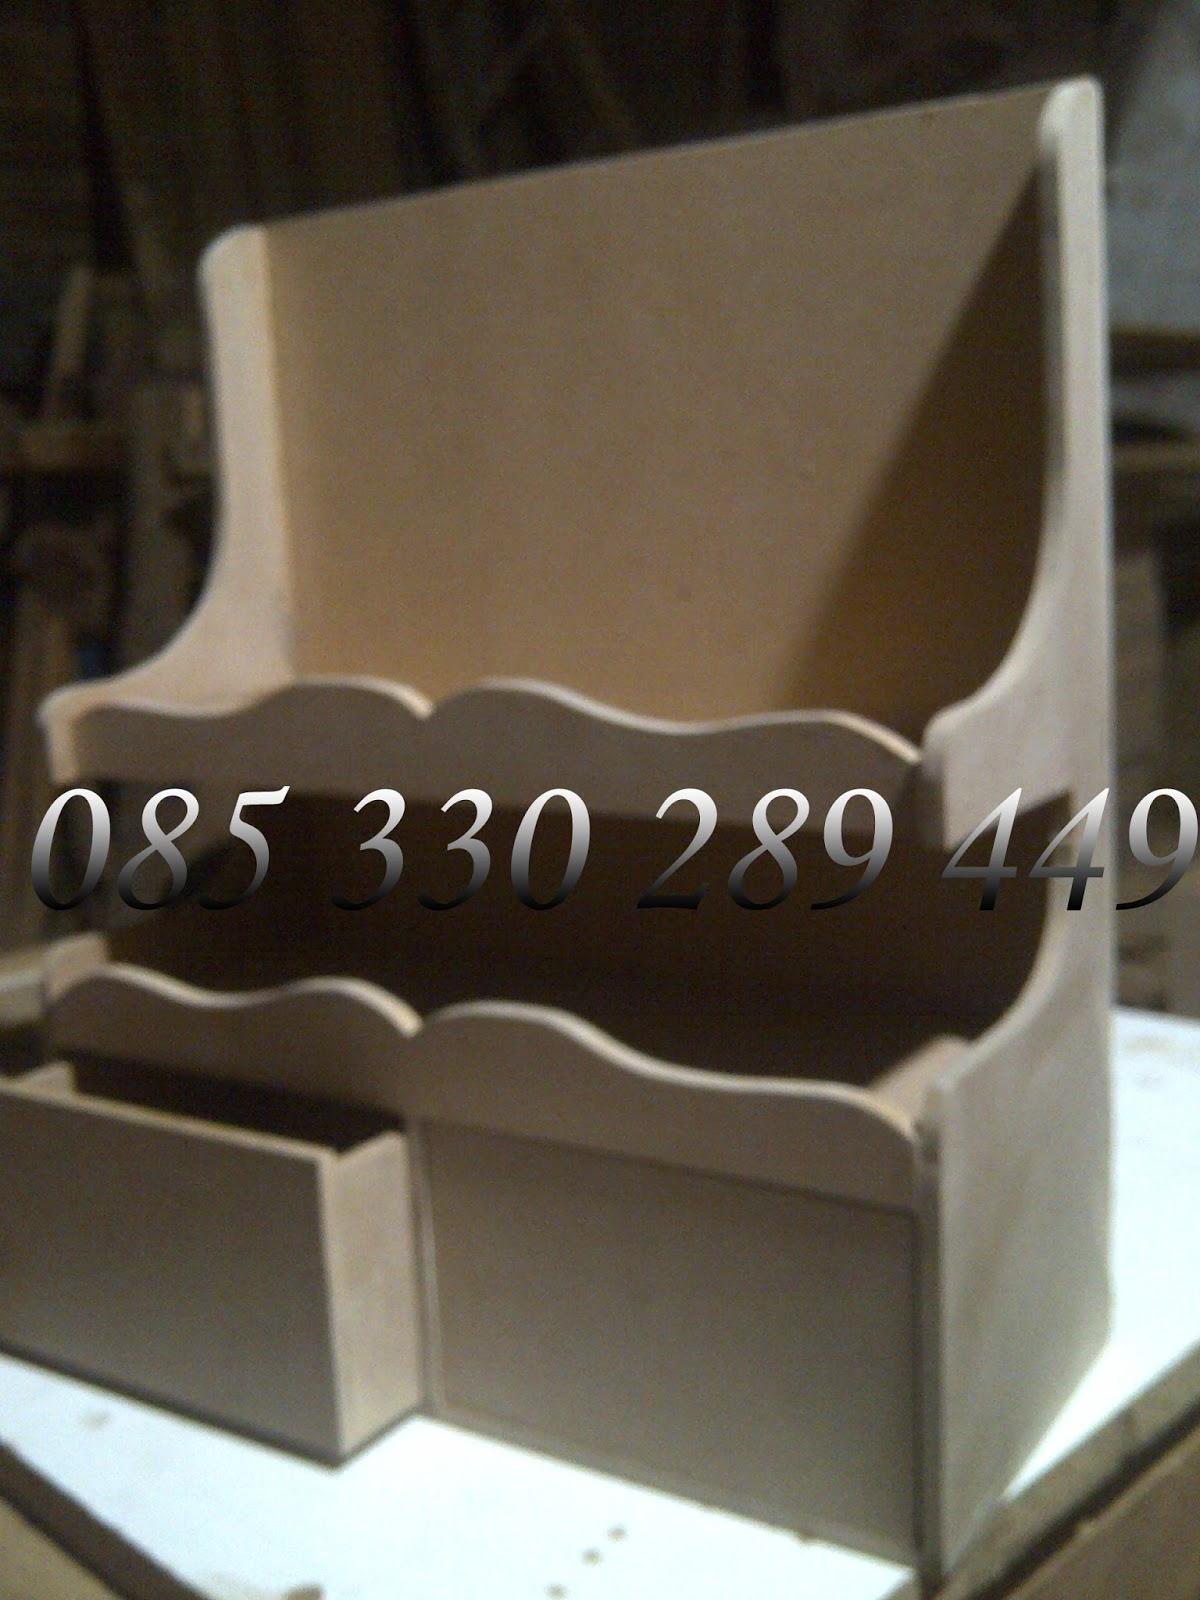 Kerajinan Souvenir Dari Kayu Limbah: Pabrik Pembuat ...